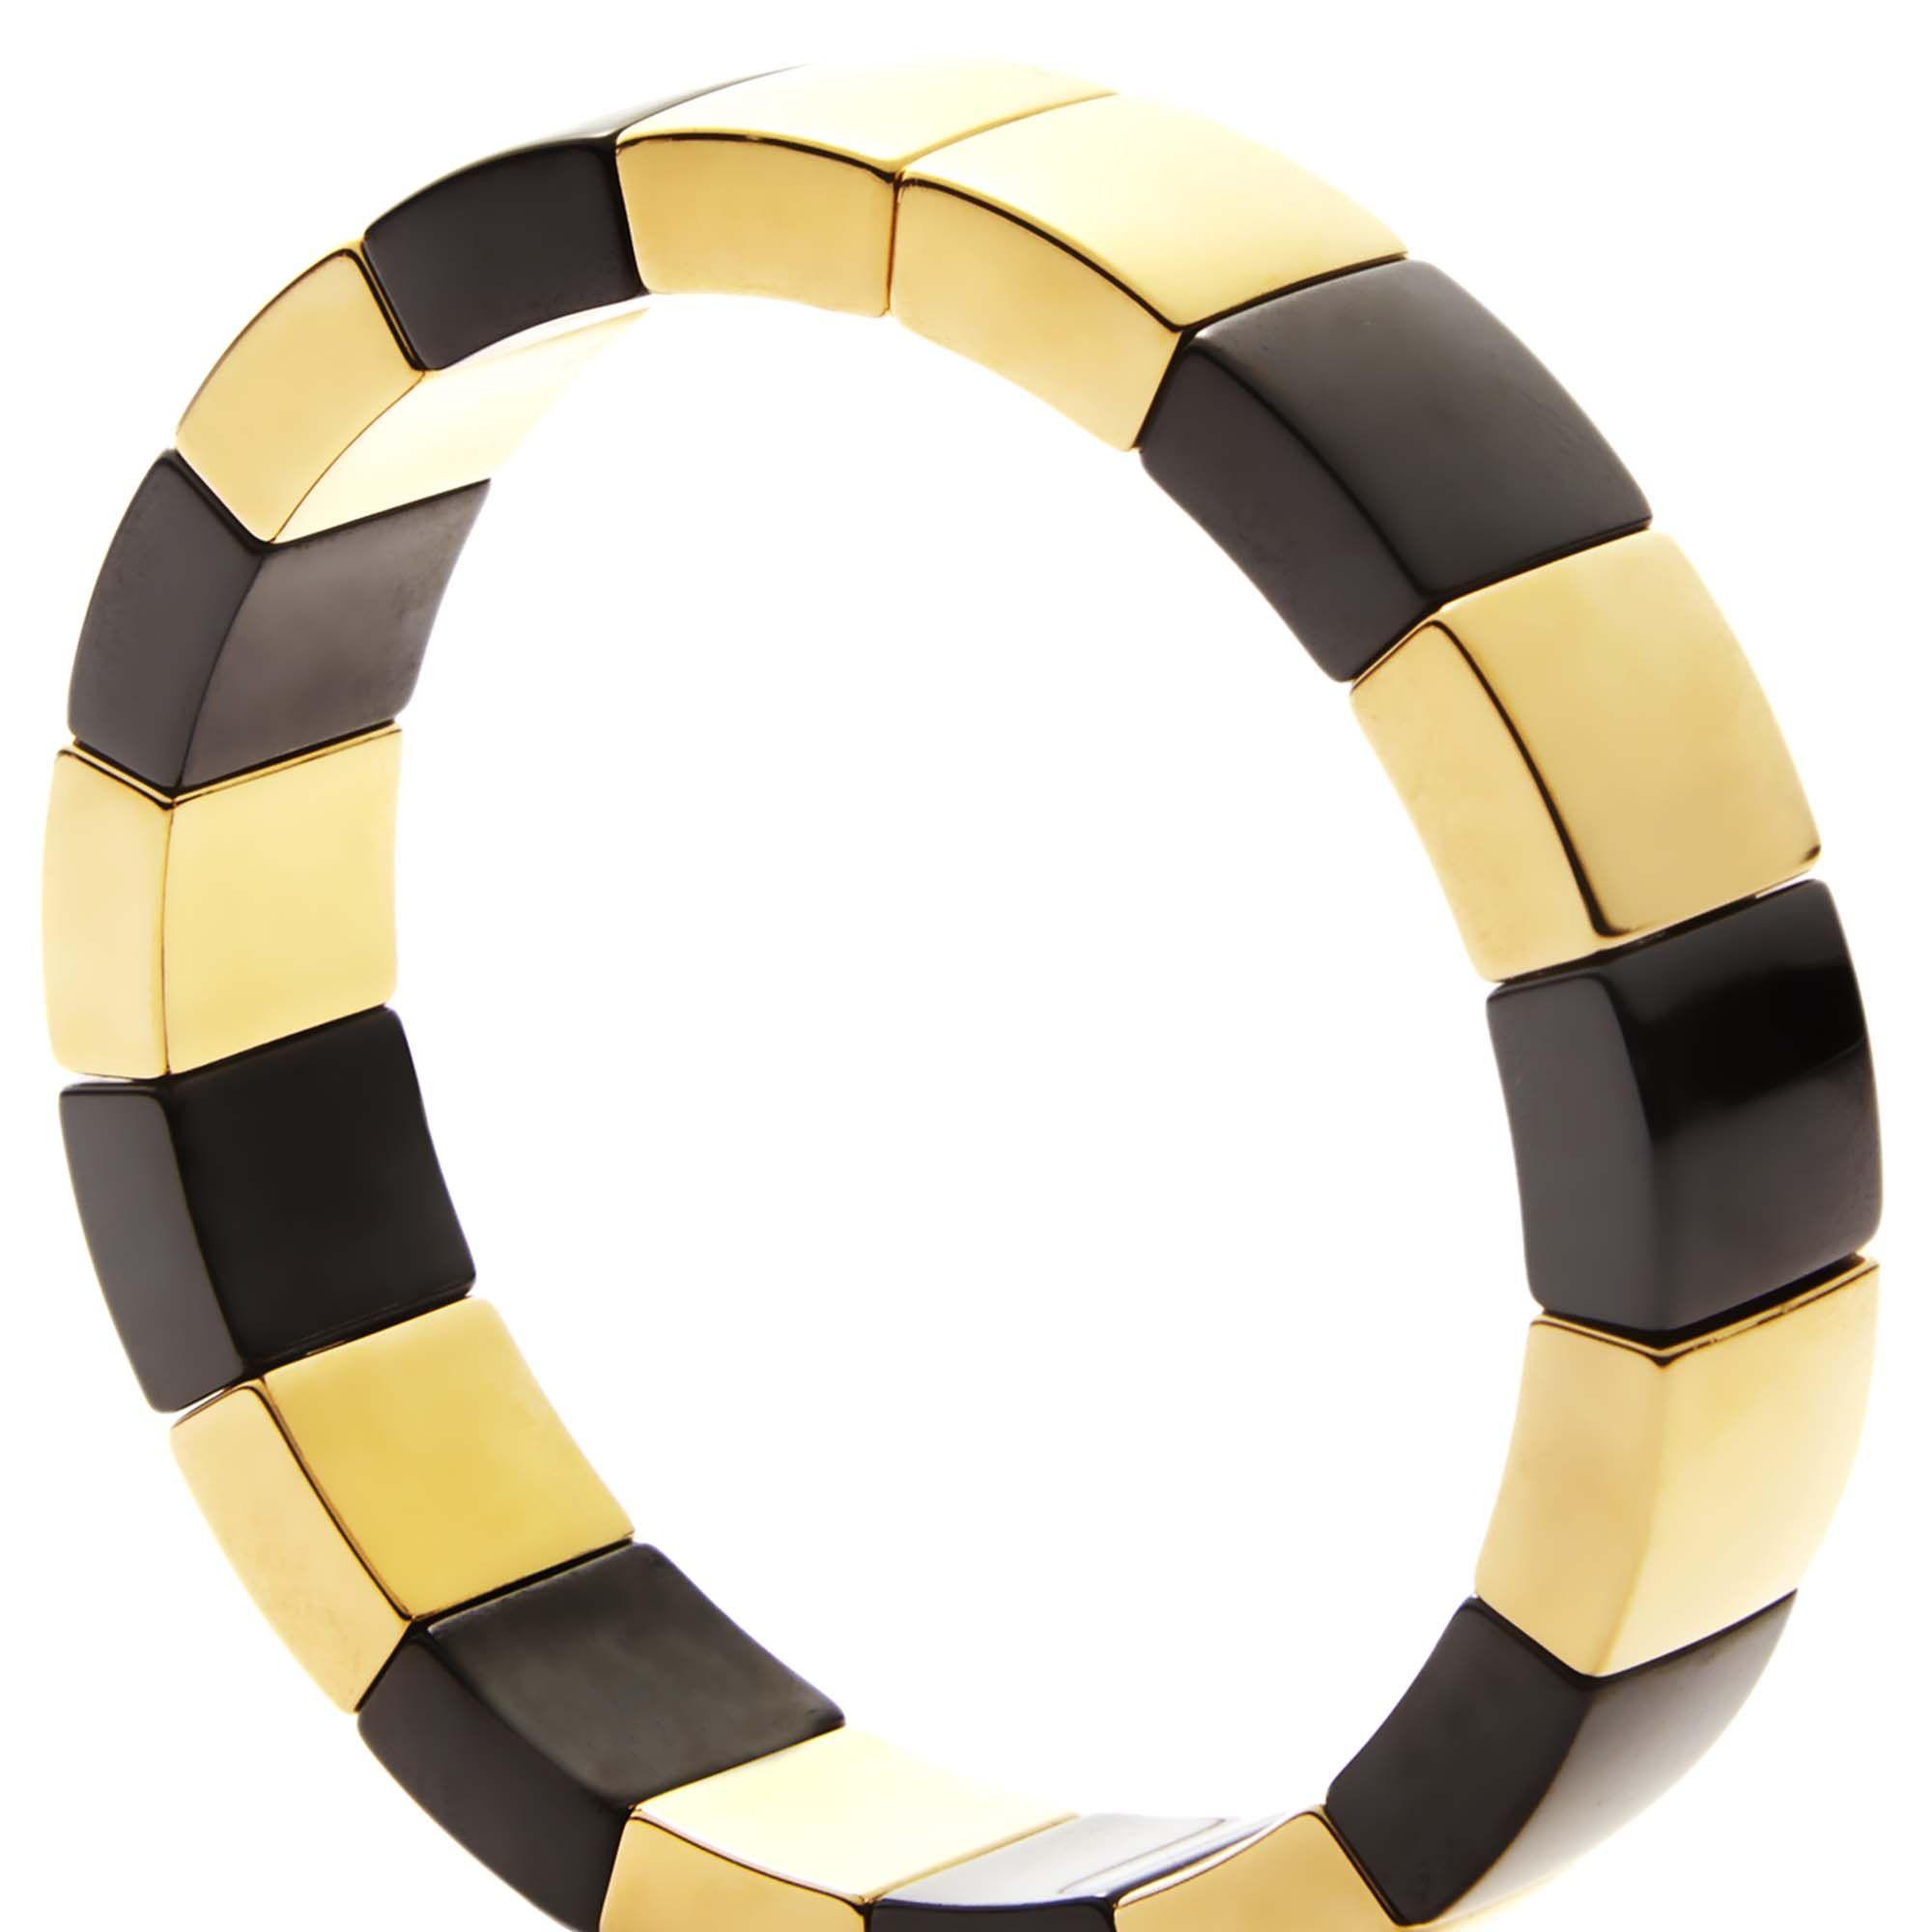 "<p><strong>Roberto Demeglio </strong>bracelet, $296, <a href=""http://www.robertodemegliousa.com/"" target=""_blank"">robertodemegliousa.com</a>. </p>"